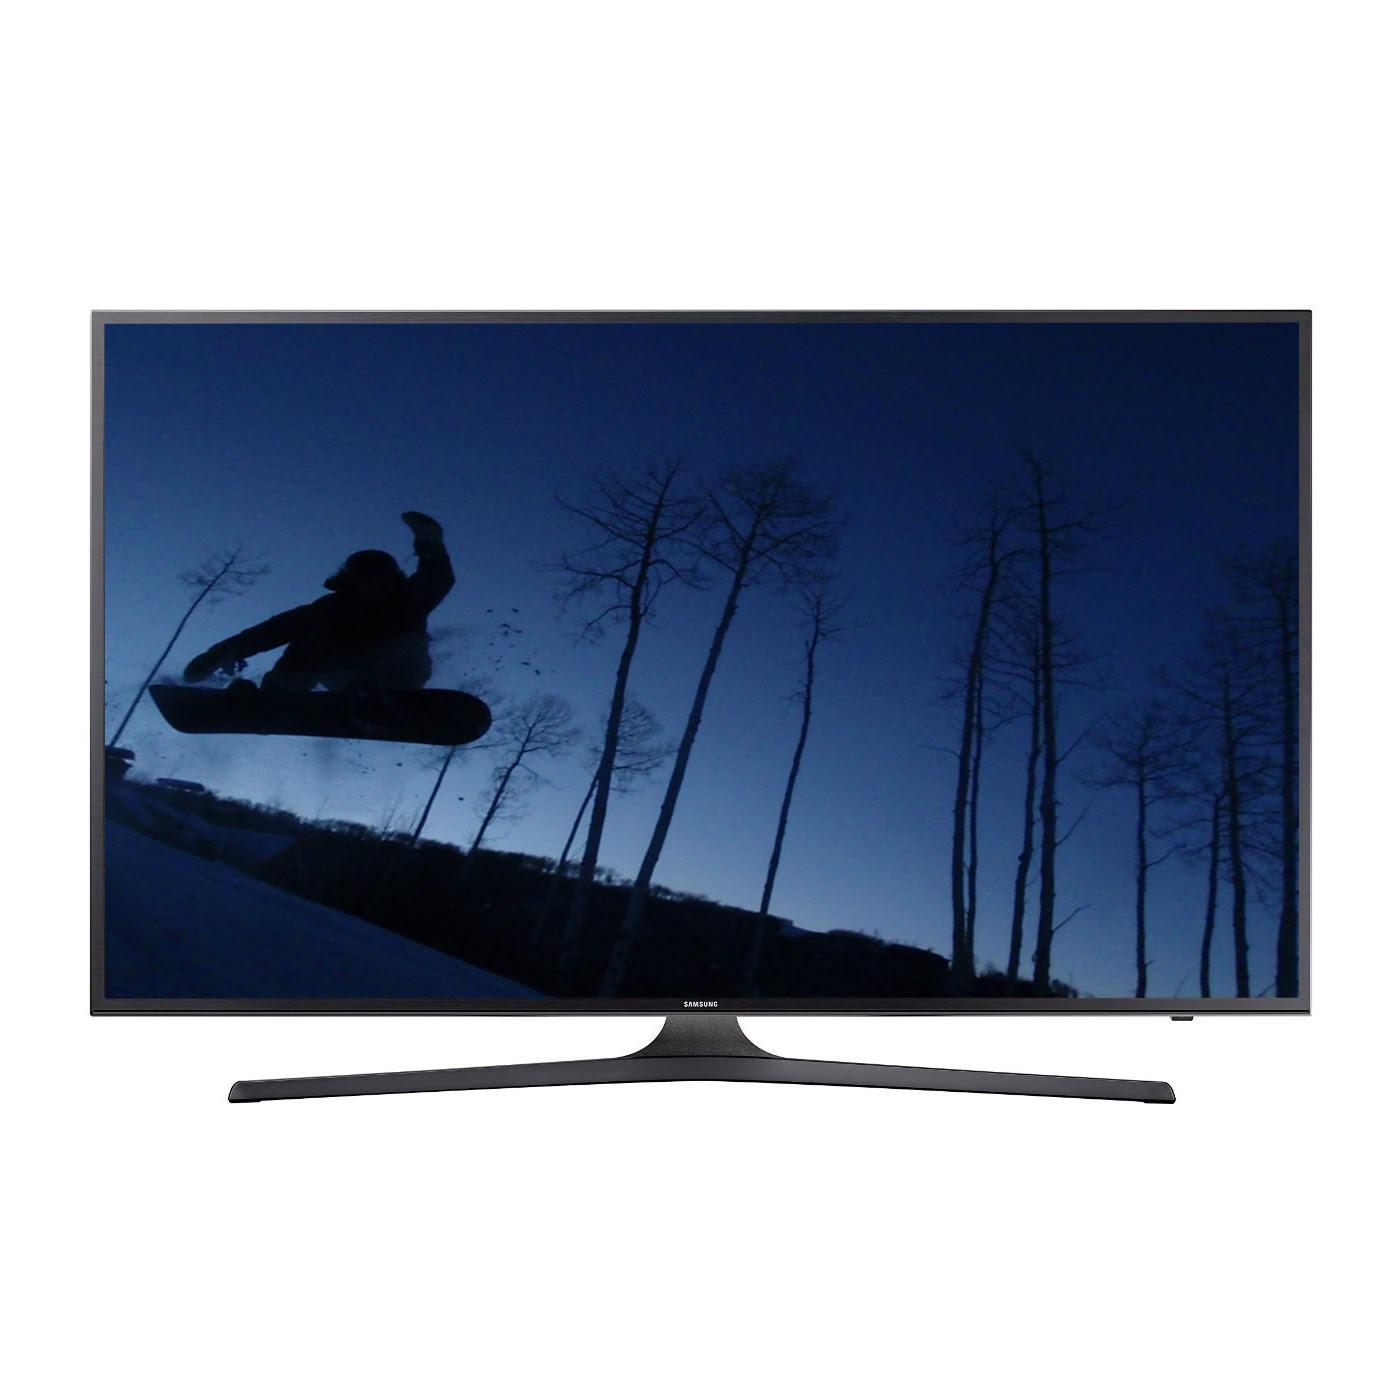 Refurbished Samsung 55. 4K Ultra Hd Smart Led Hdtv W\/ Wifi-UN55KU6300FXZA